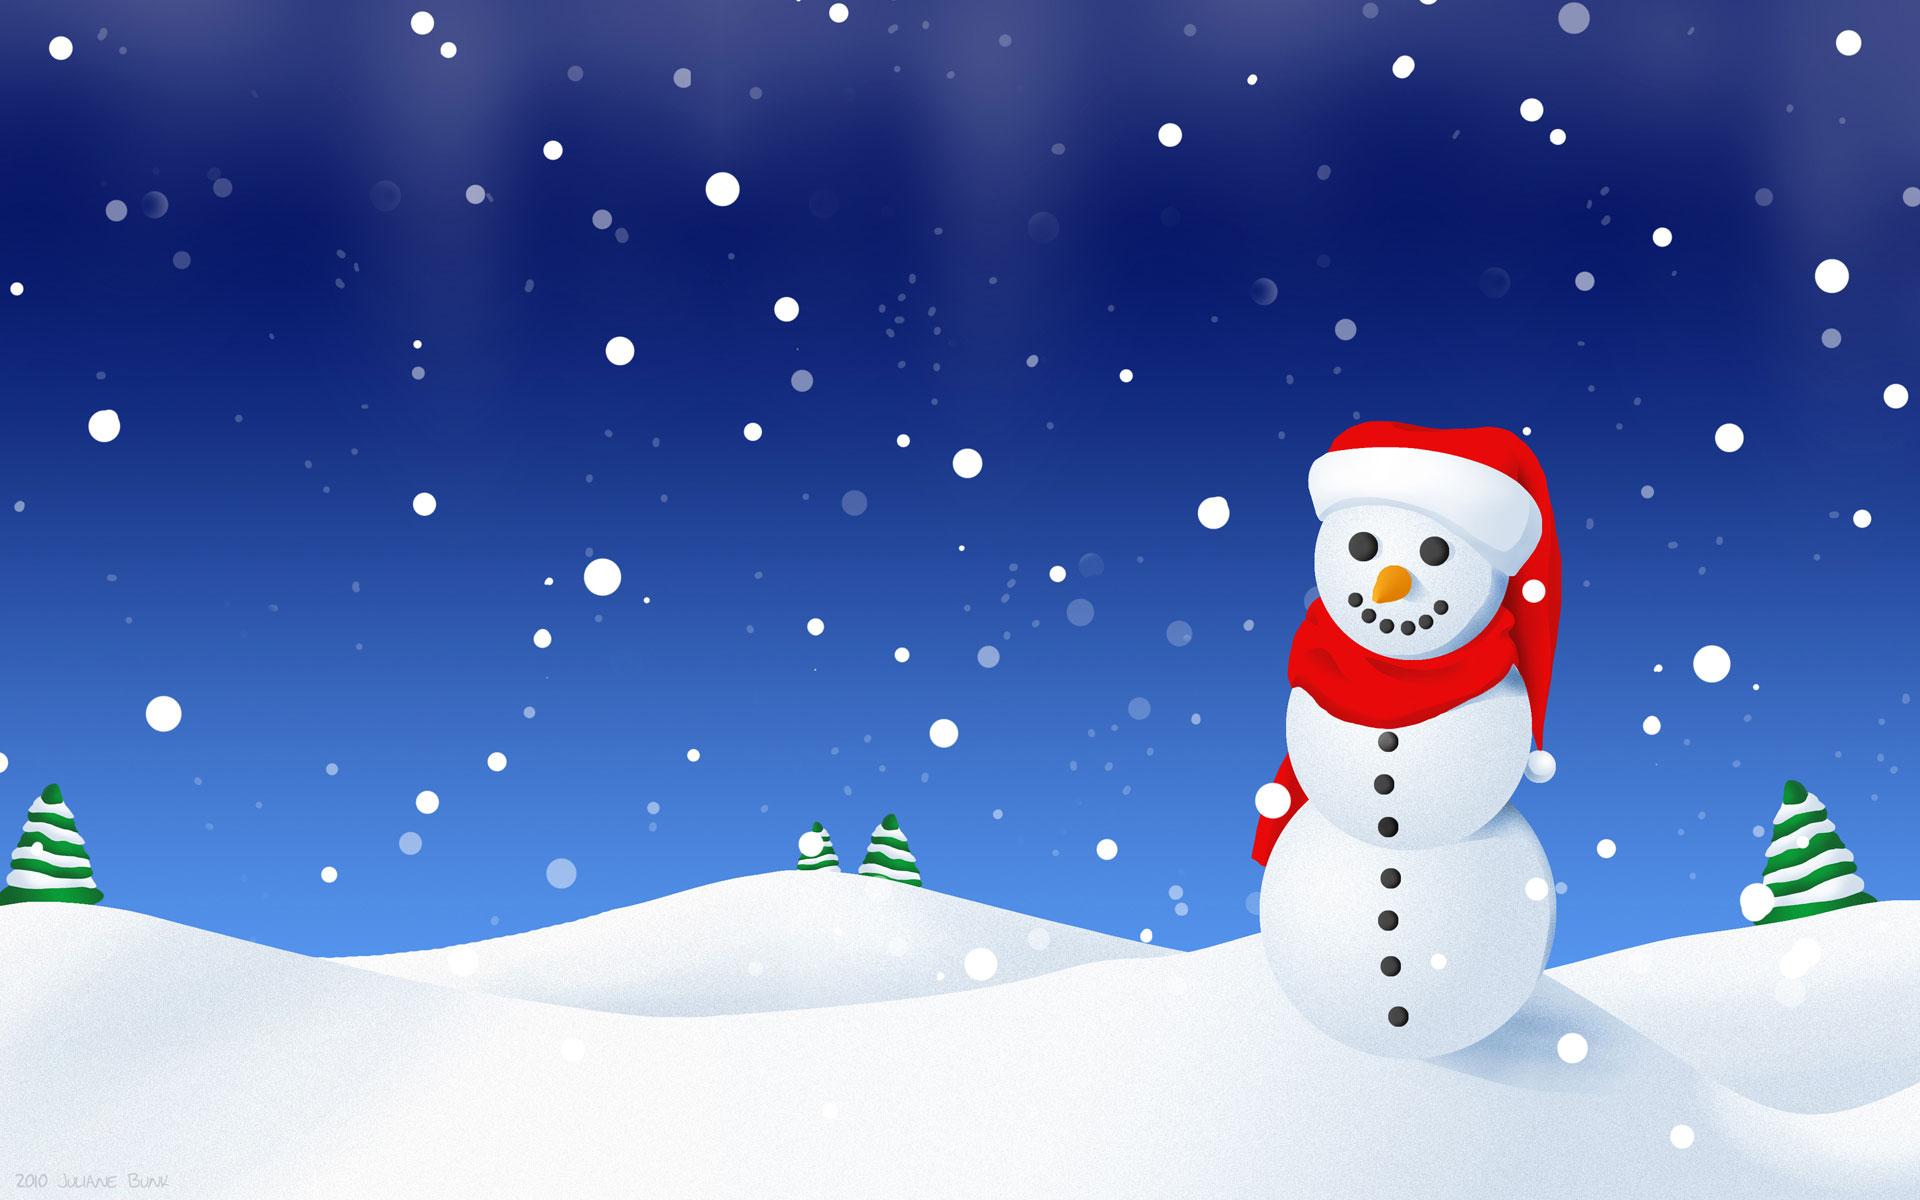 Live 3d Wallpaper Snowing Snowman Wallpaper 1920x1200 47300